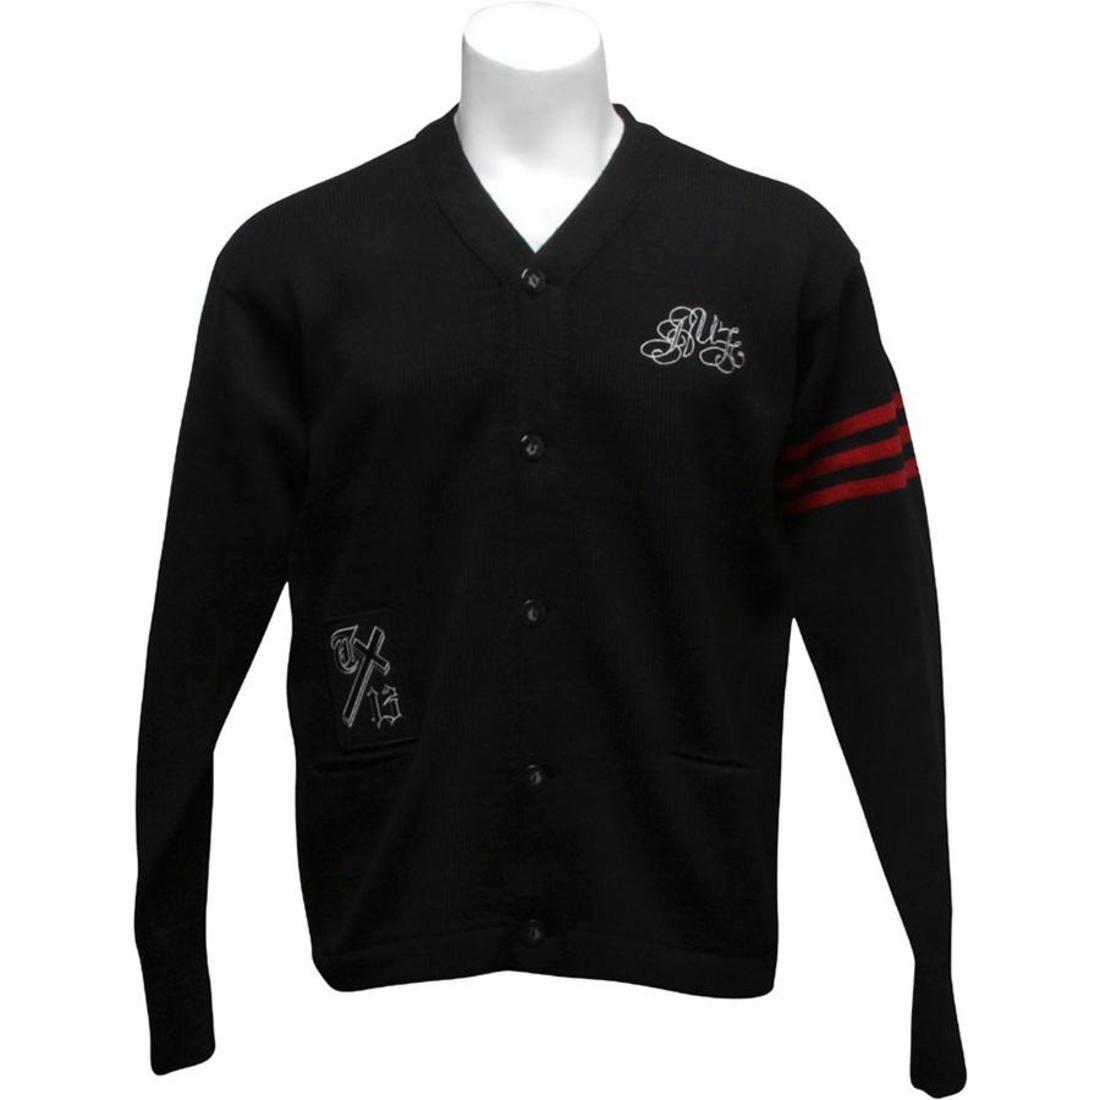 HUF ハフ 黒 ブラック 【 HUF BLACK CORBIN VCOAT 】 メンズファッション トップス スウェット トレーナー